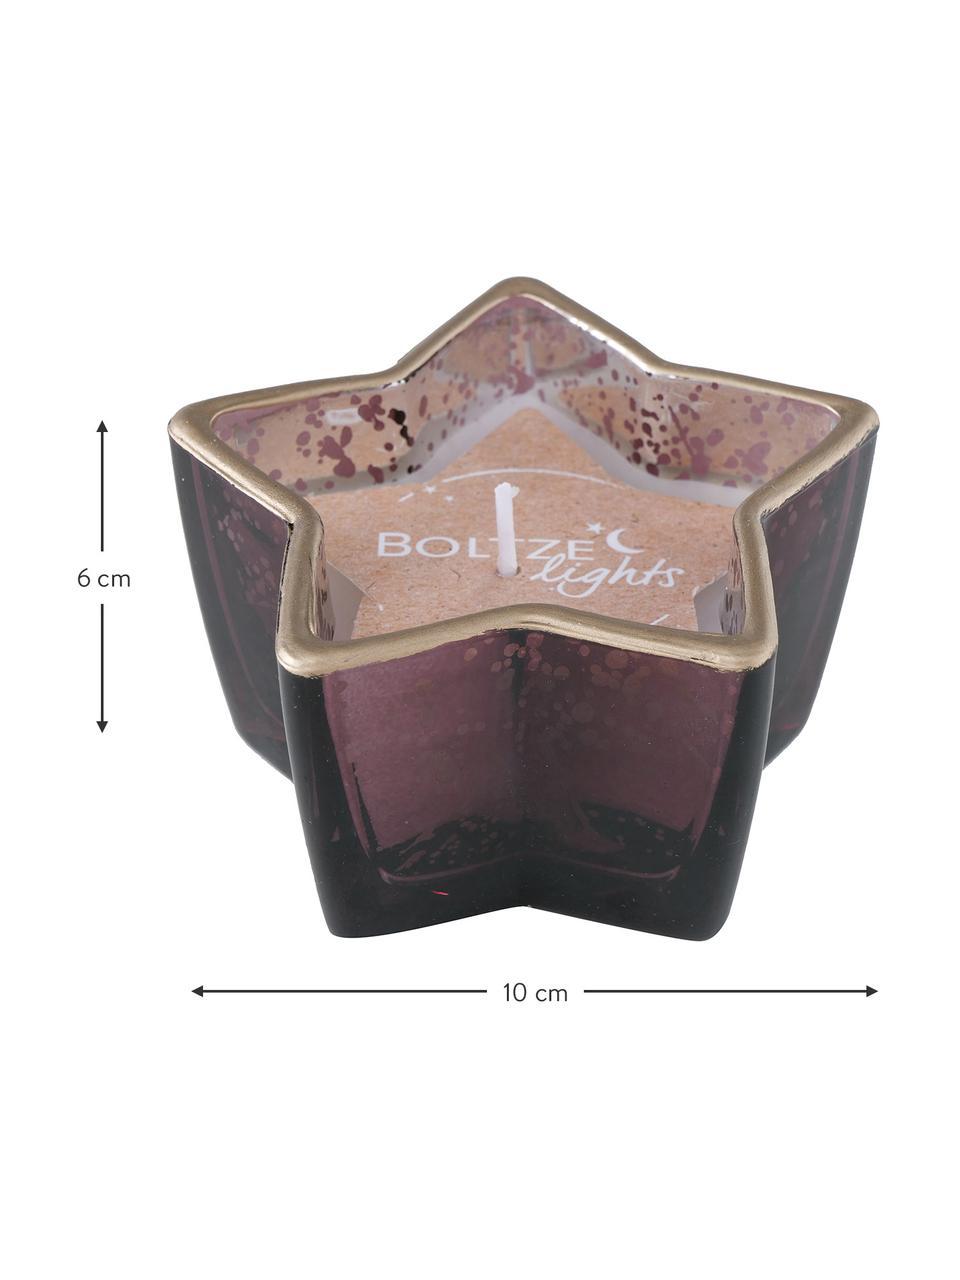 Deko-Kerzen-Set Delisa Ø 10 cm, 3 Stück, Behälter: Glas, Dunkelrosa, 10 x 6 cm